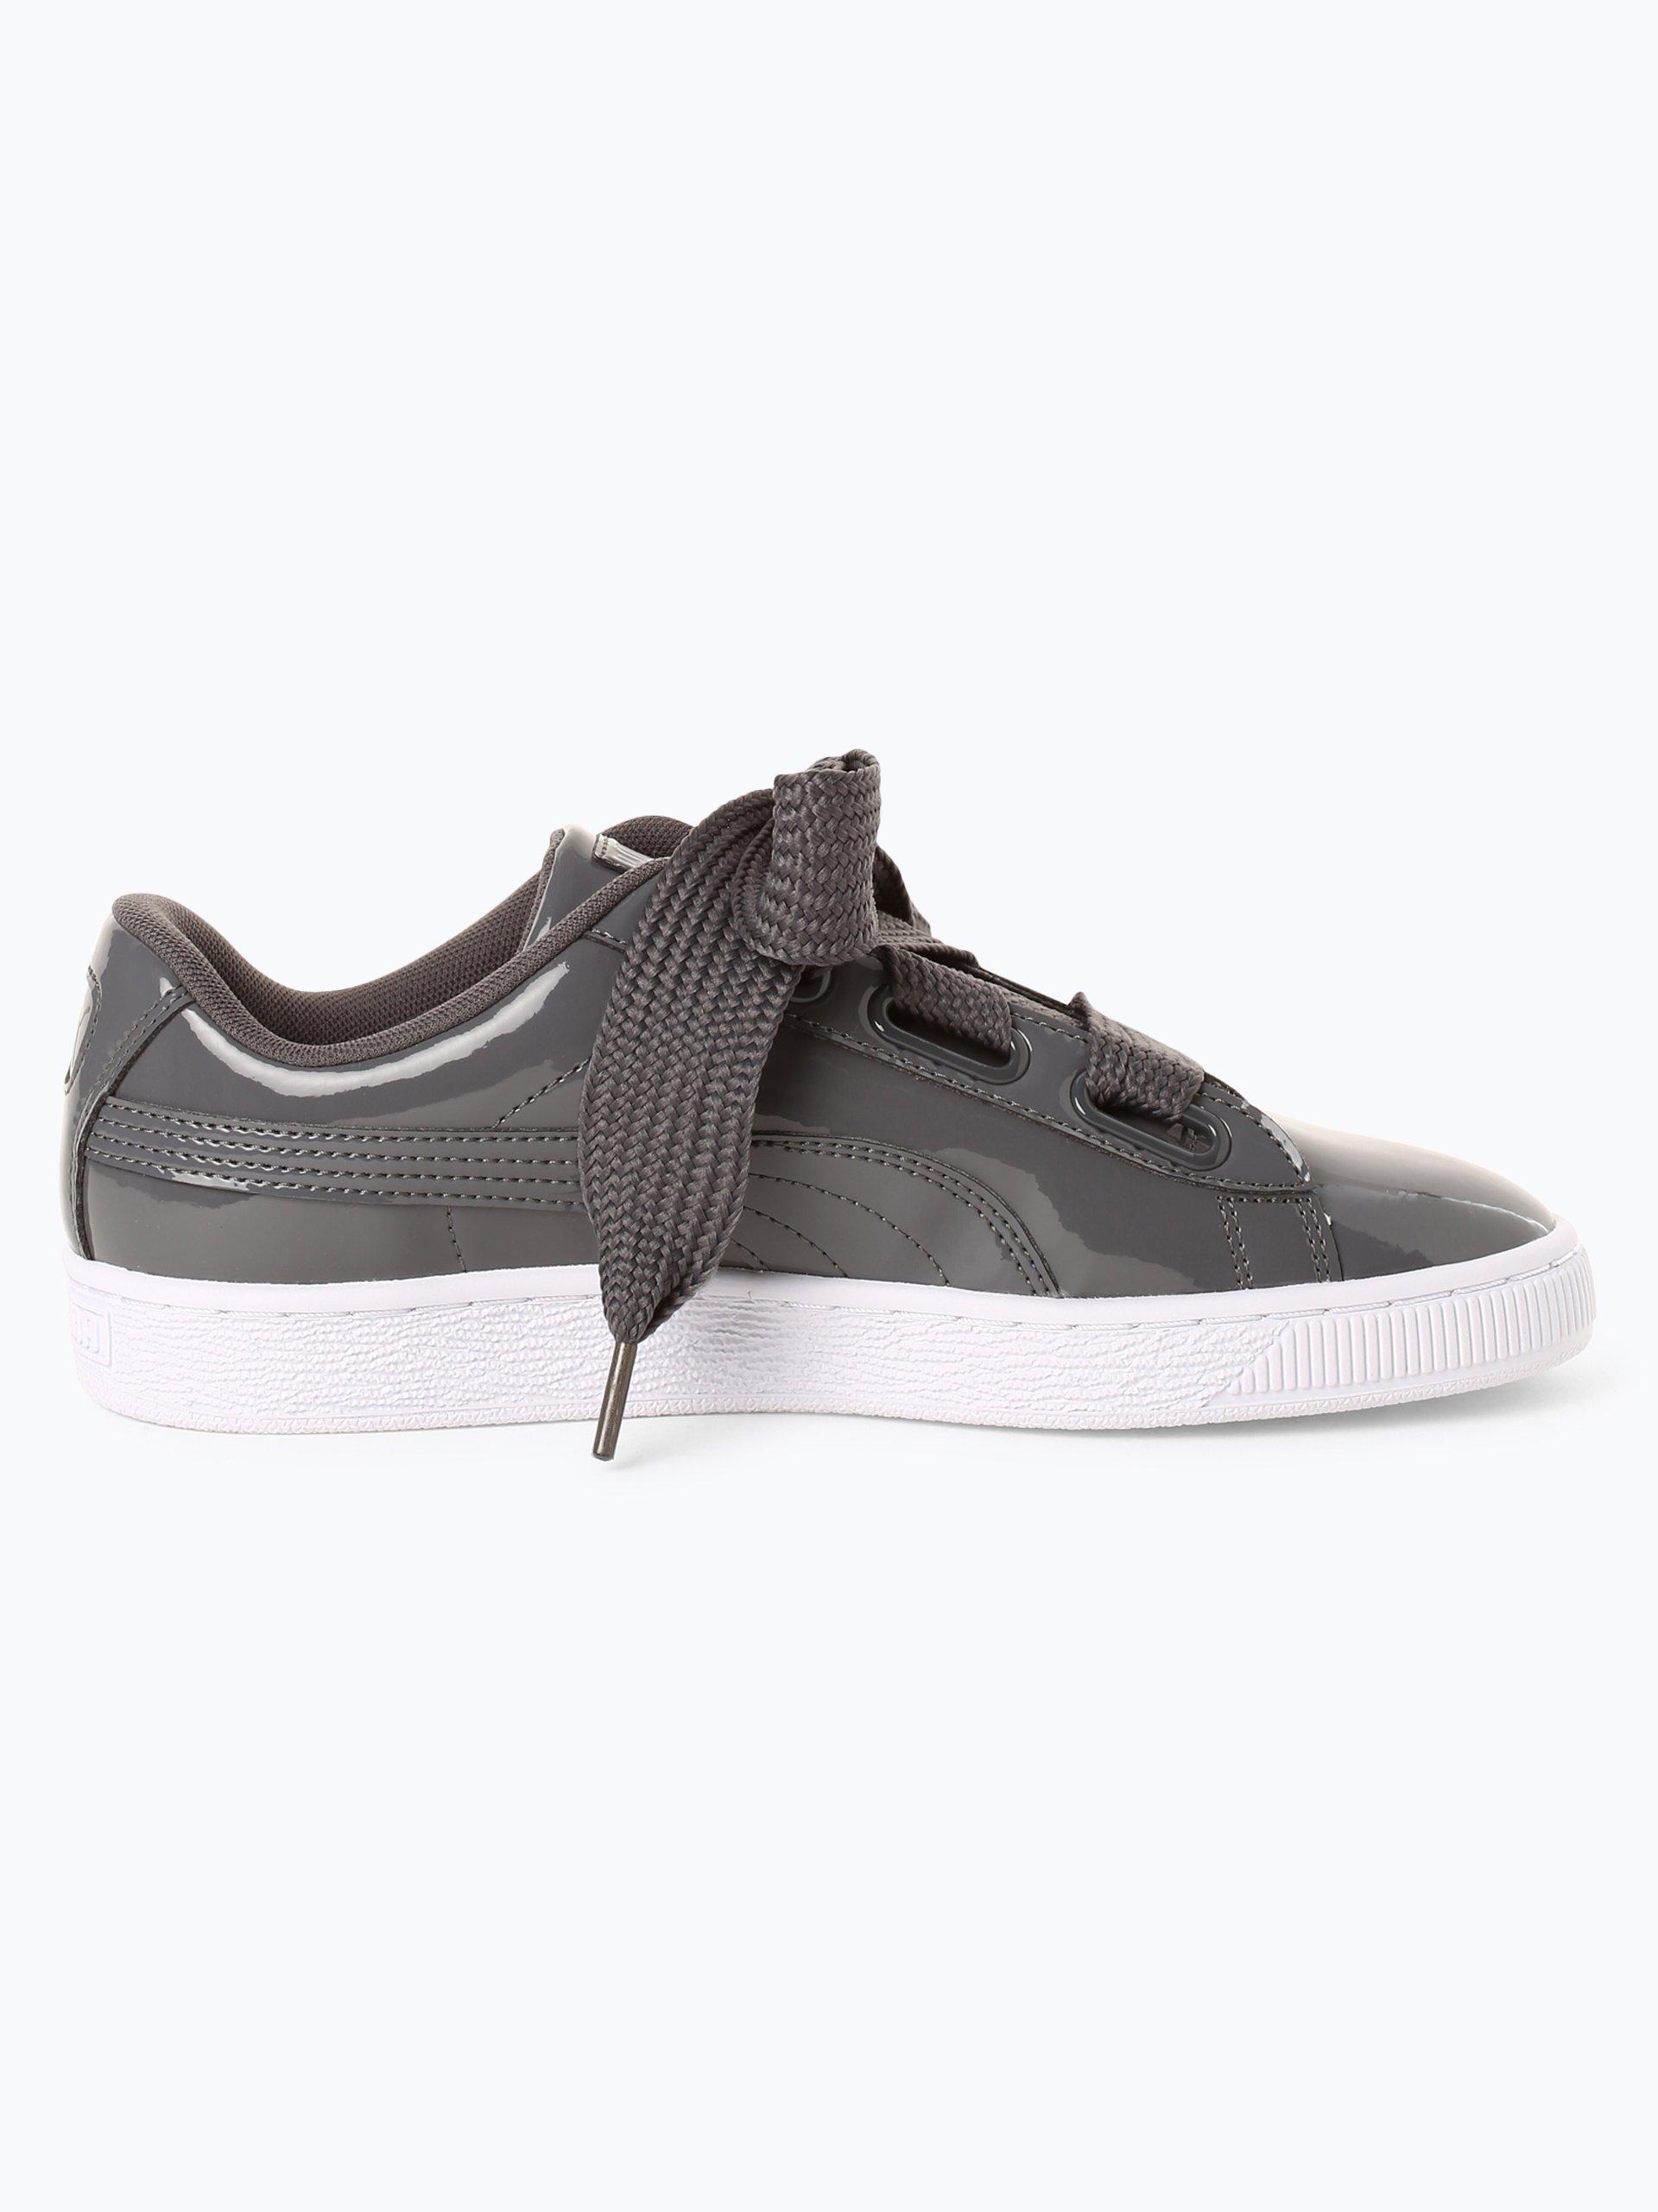 puma damen sneaker basket grau uni online kaufen. Black Bedroom Furniture Sets. Home Design Ideas